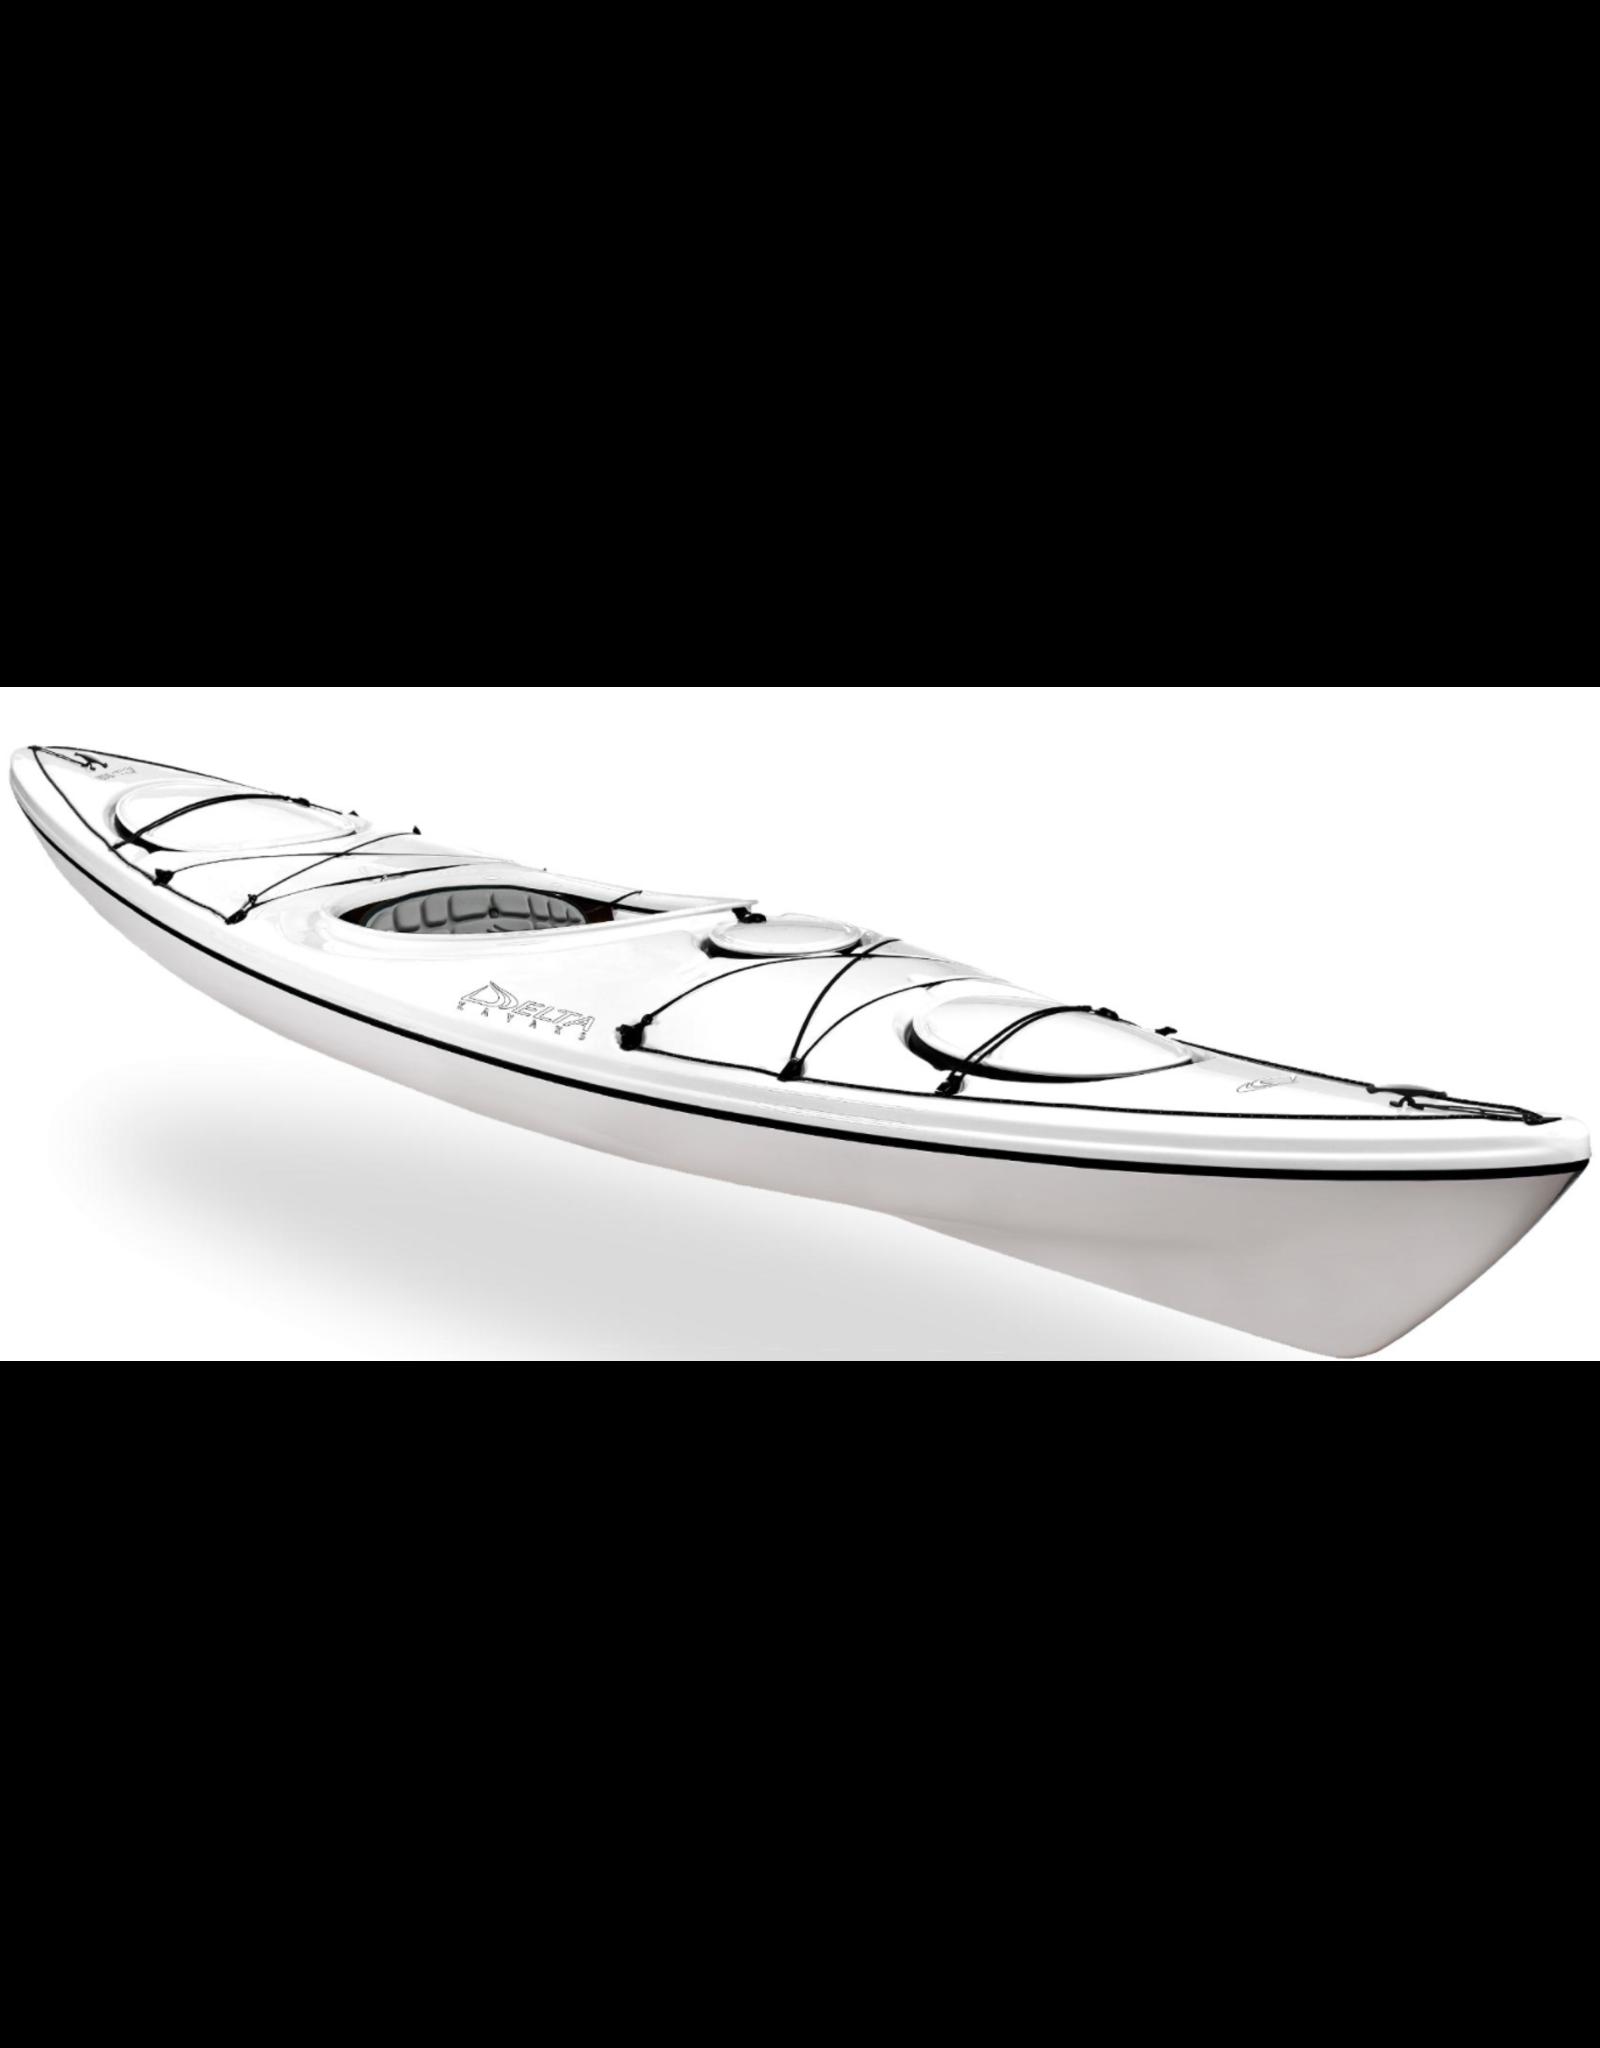 Delta Delta kayak 12.10